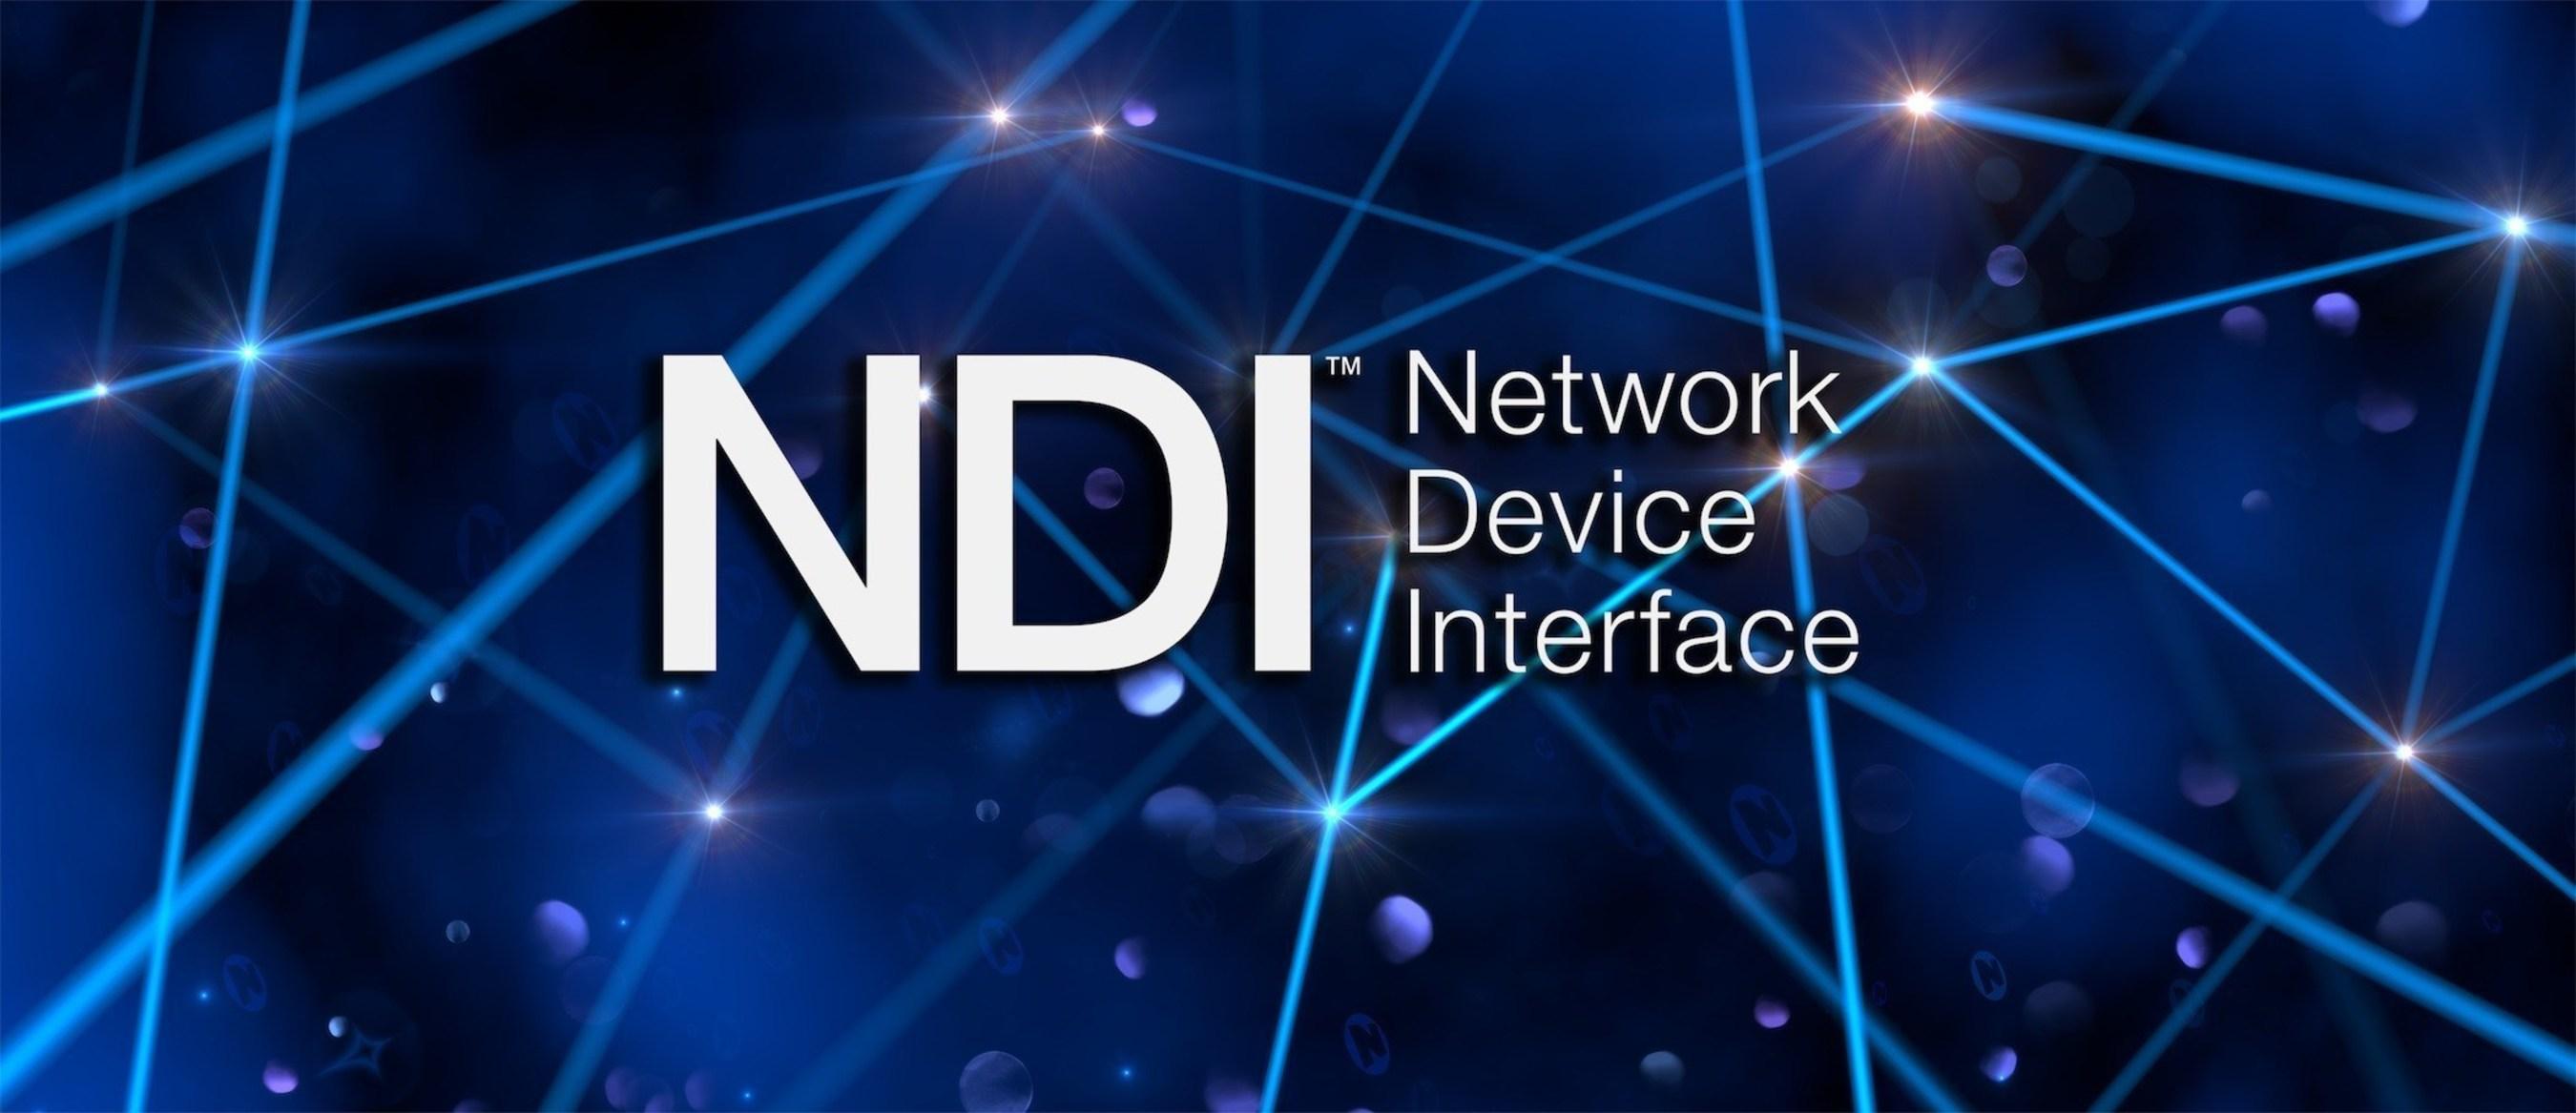 Newtek Network Device Interface (NDI) for IP-based workflows.